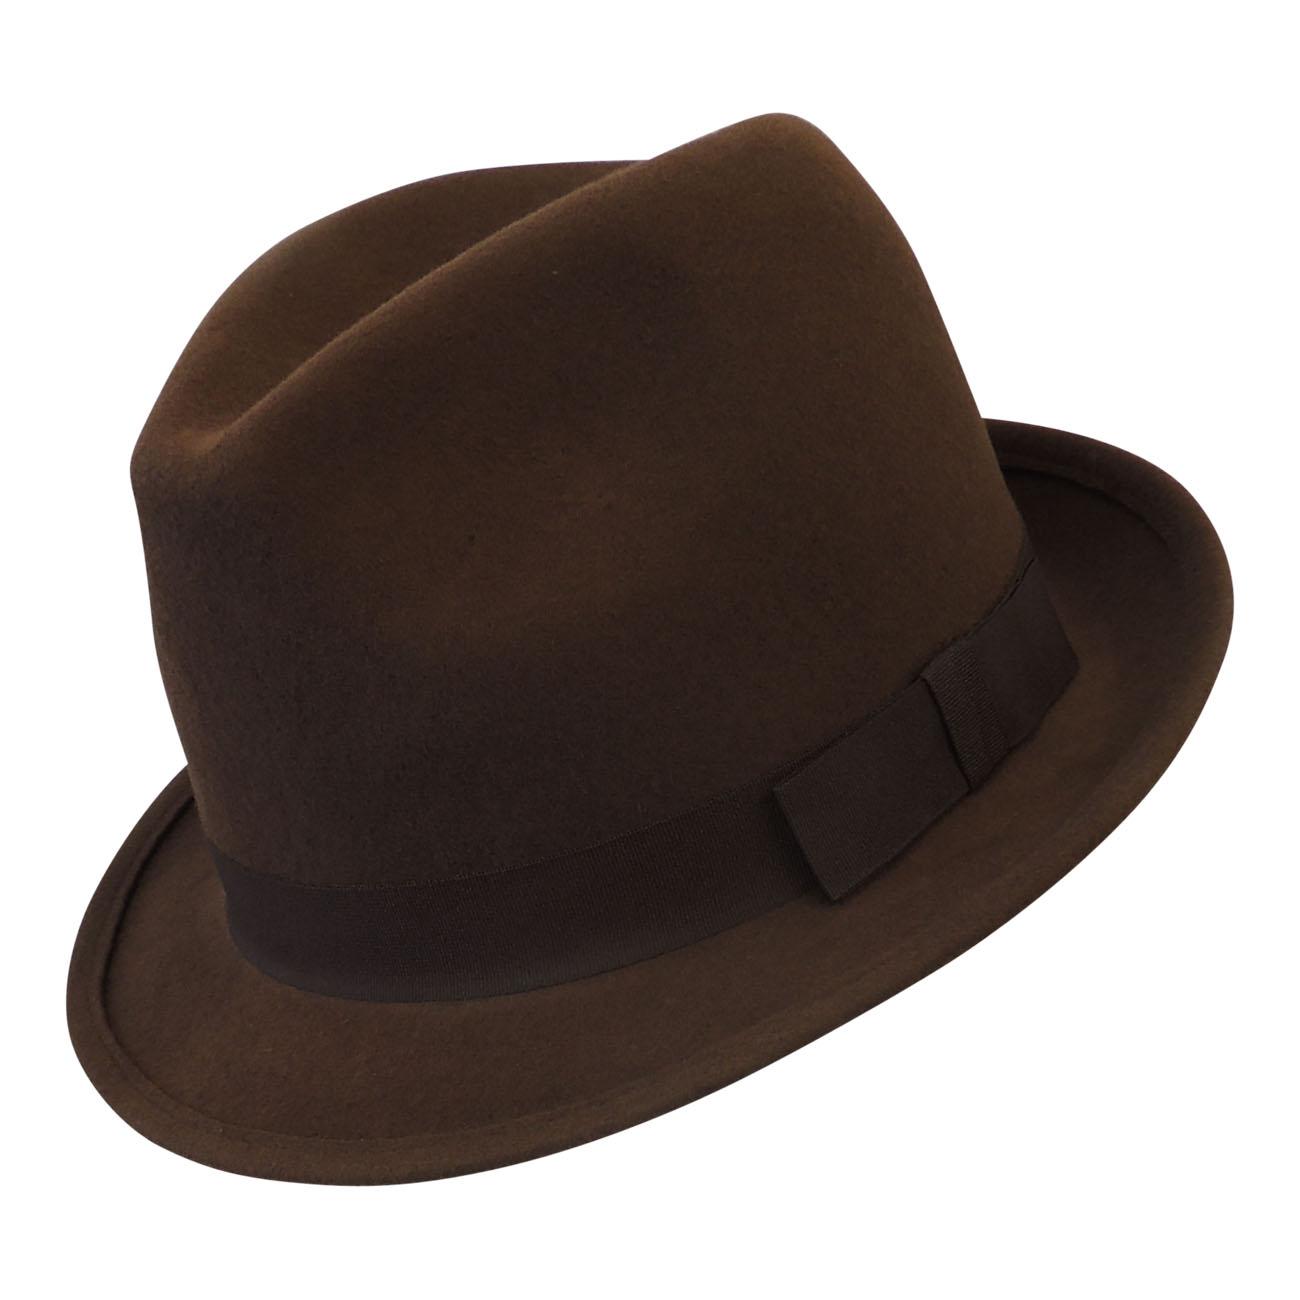 30c01d810e8caf New Men's Classic 1930's 1940's Vtg style Wool Felt Gangster Mafia Trilby  Hat